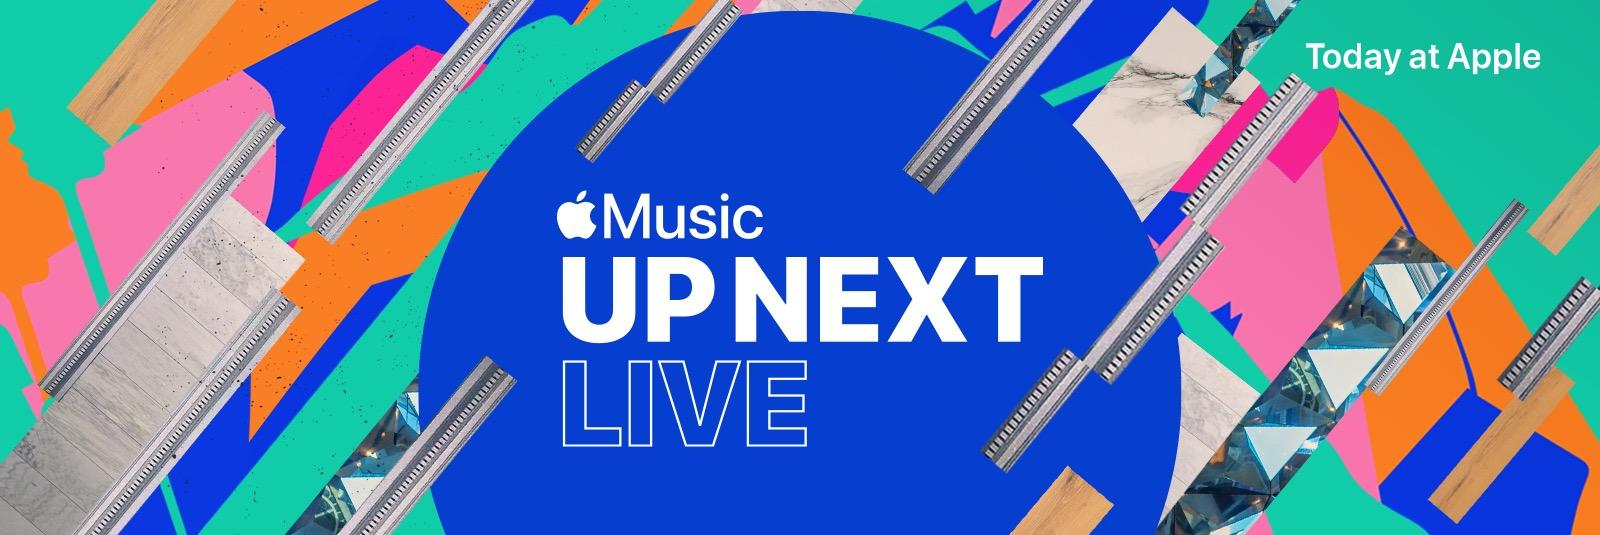 Apple's Up Next Live concert banner